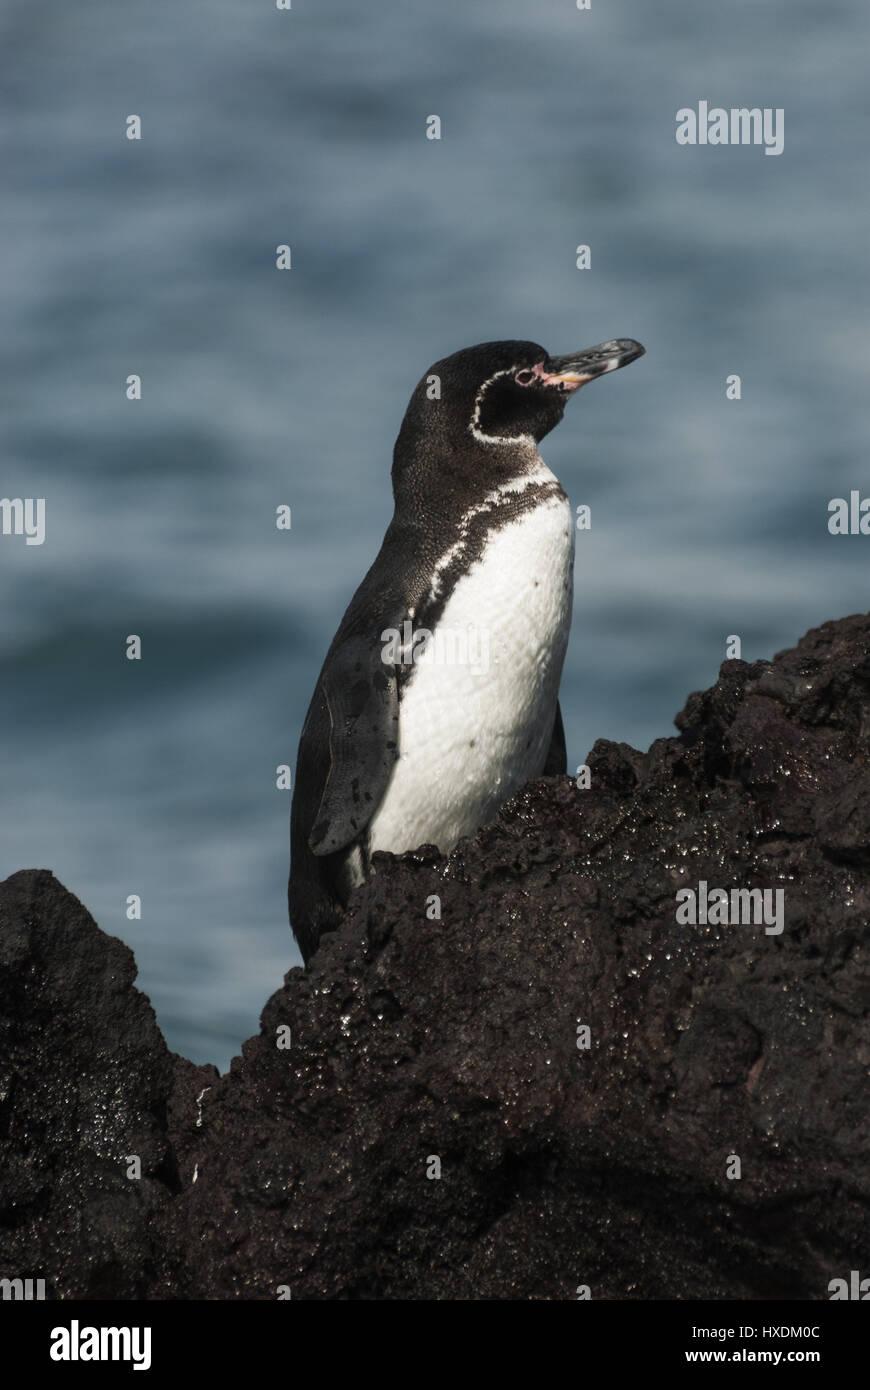 Ecuador, Galapagos, Isabela island, Elizabeth Bay, Galapagos penguin - Stock Image